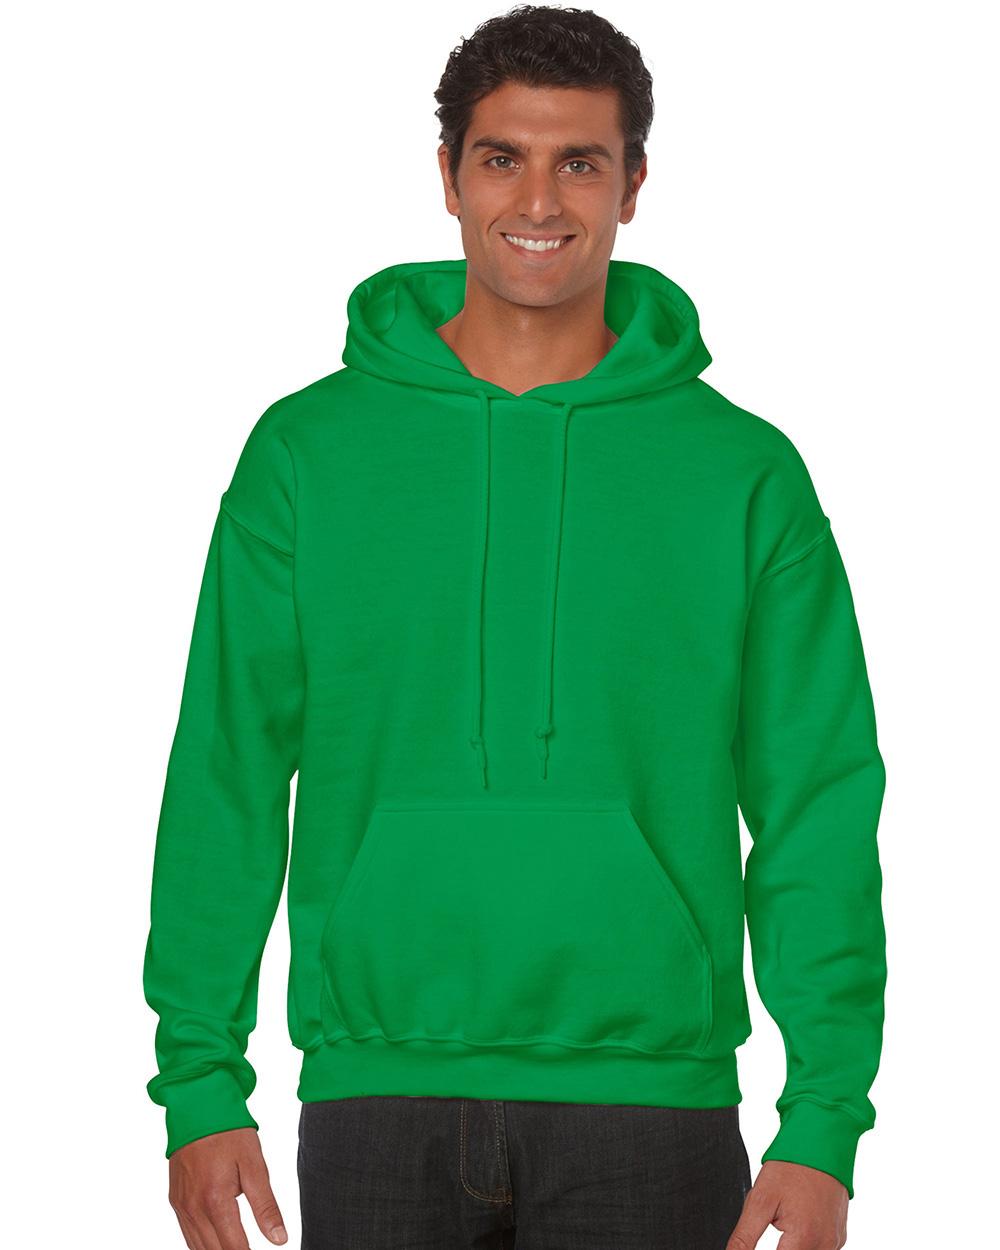 Gildan 18500     Classic Fit Adult Hooded Sweatshirt    50% Cotton / 50% Polyester Fleece